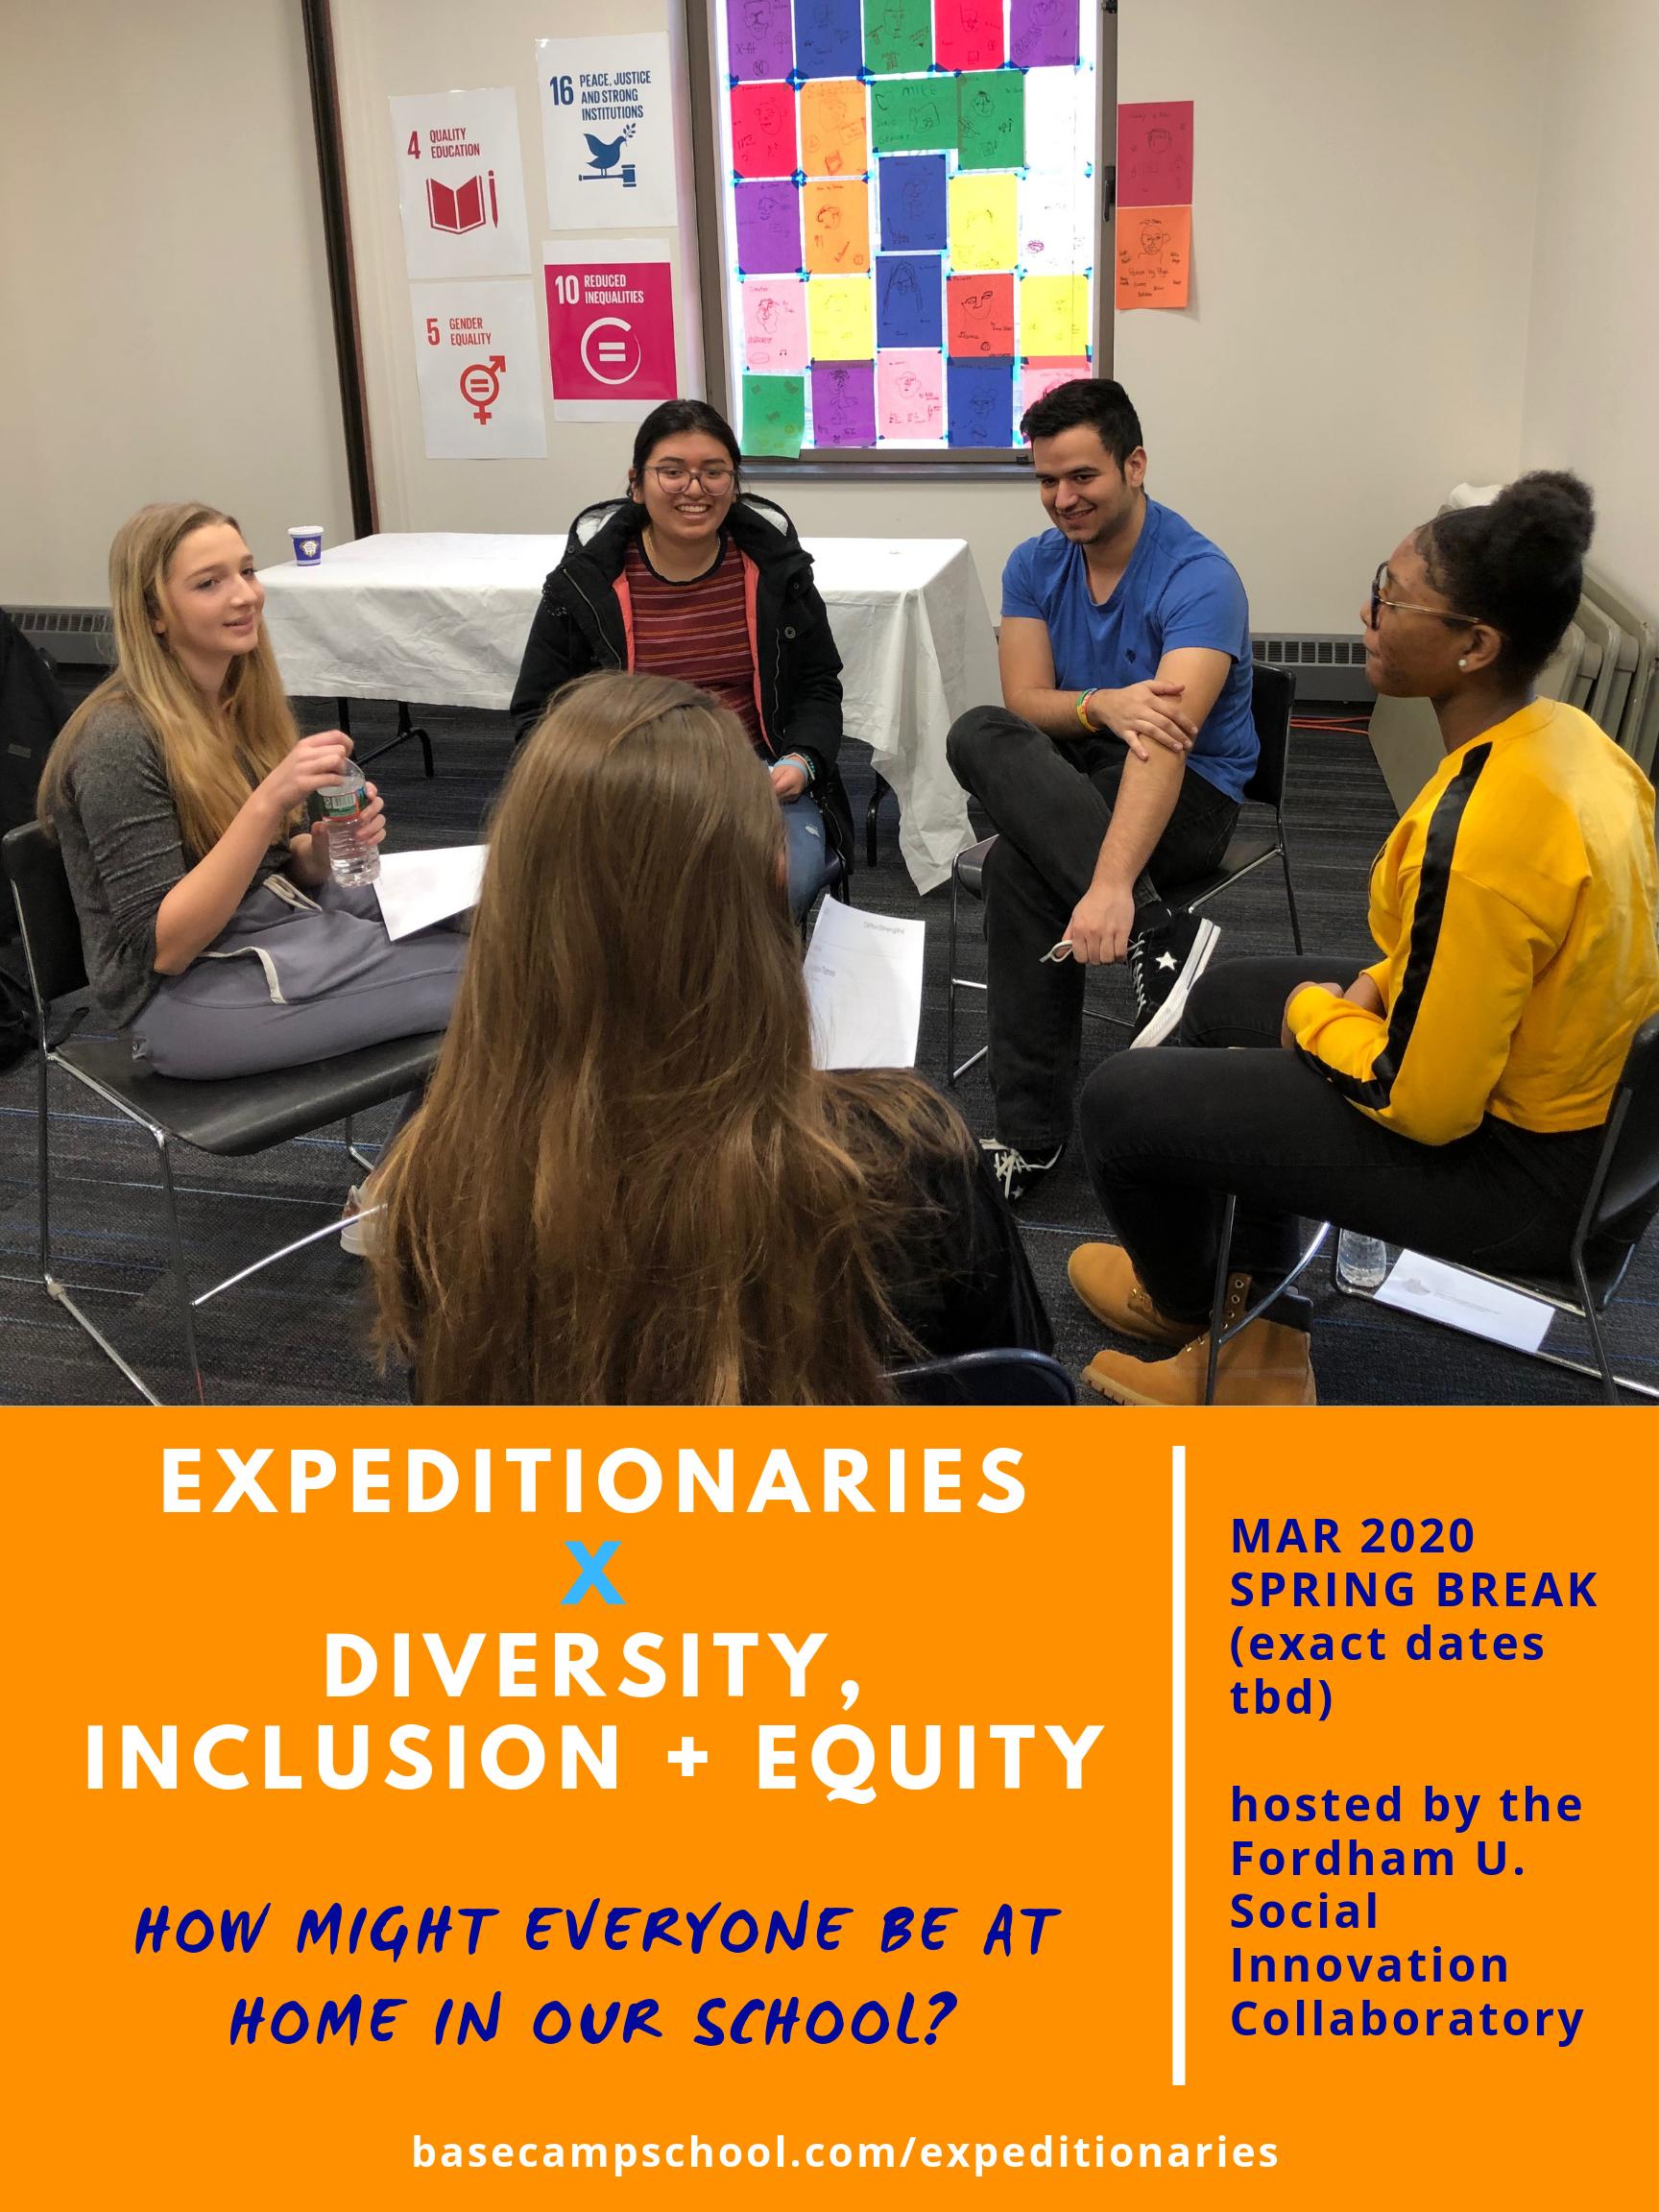 EXP x Diversity Inclusion Equity Mar 2020.png